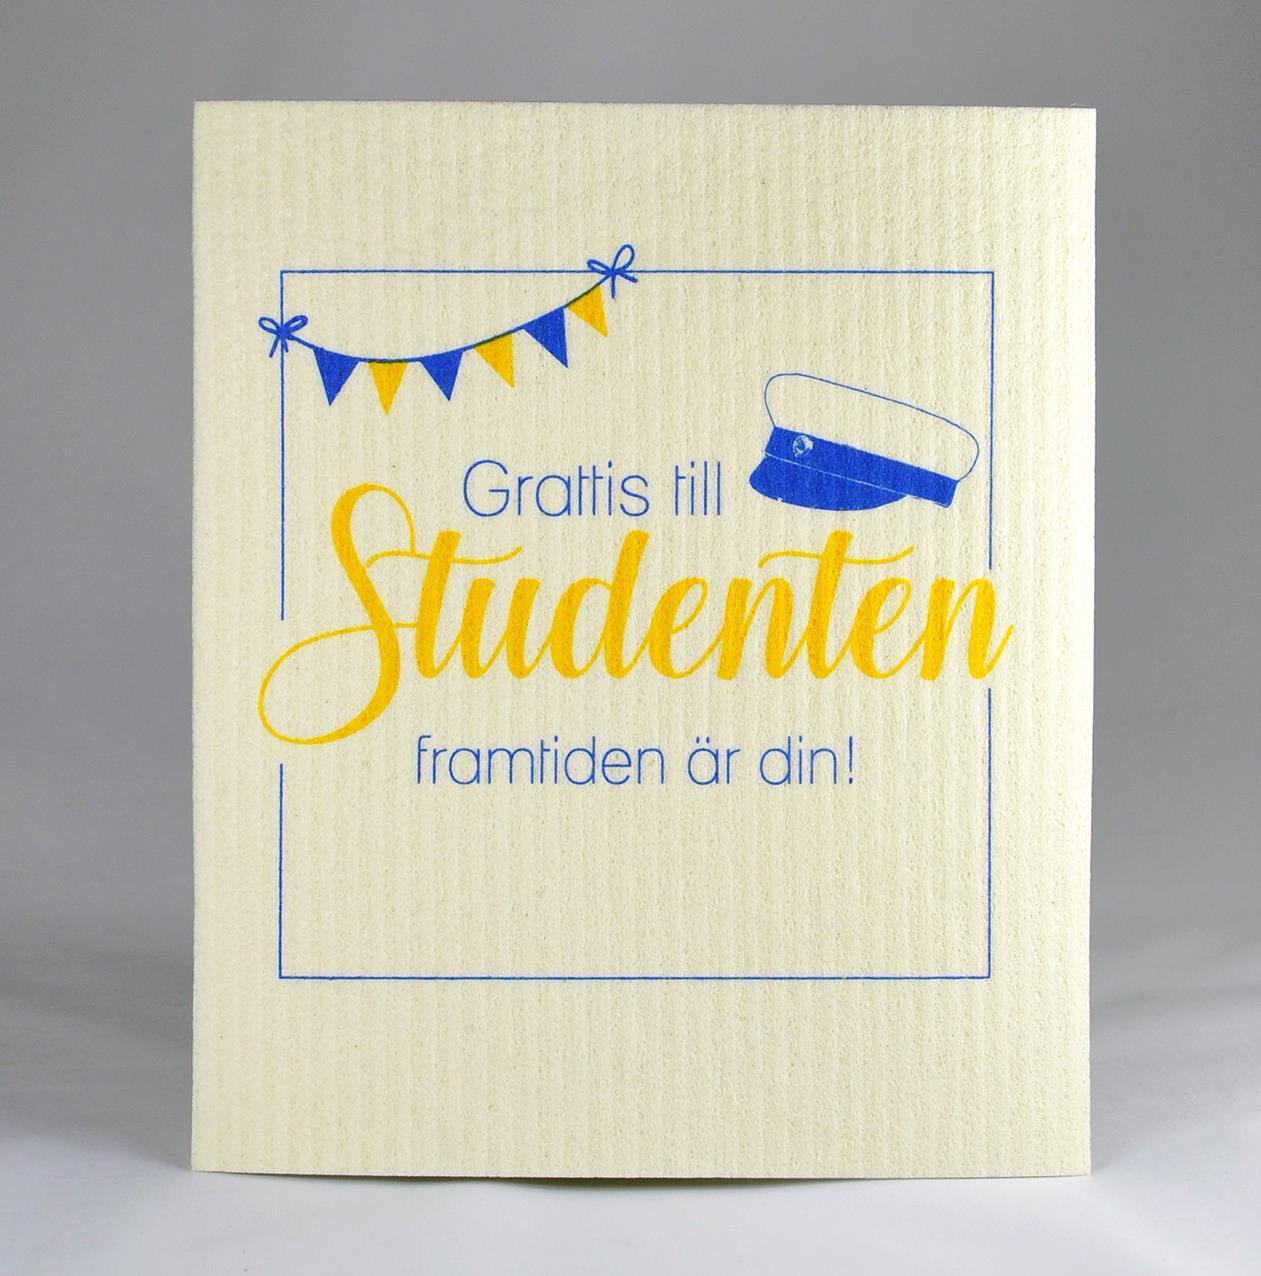 Disktrasa, Studenten, vit/blå-gul text